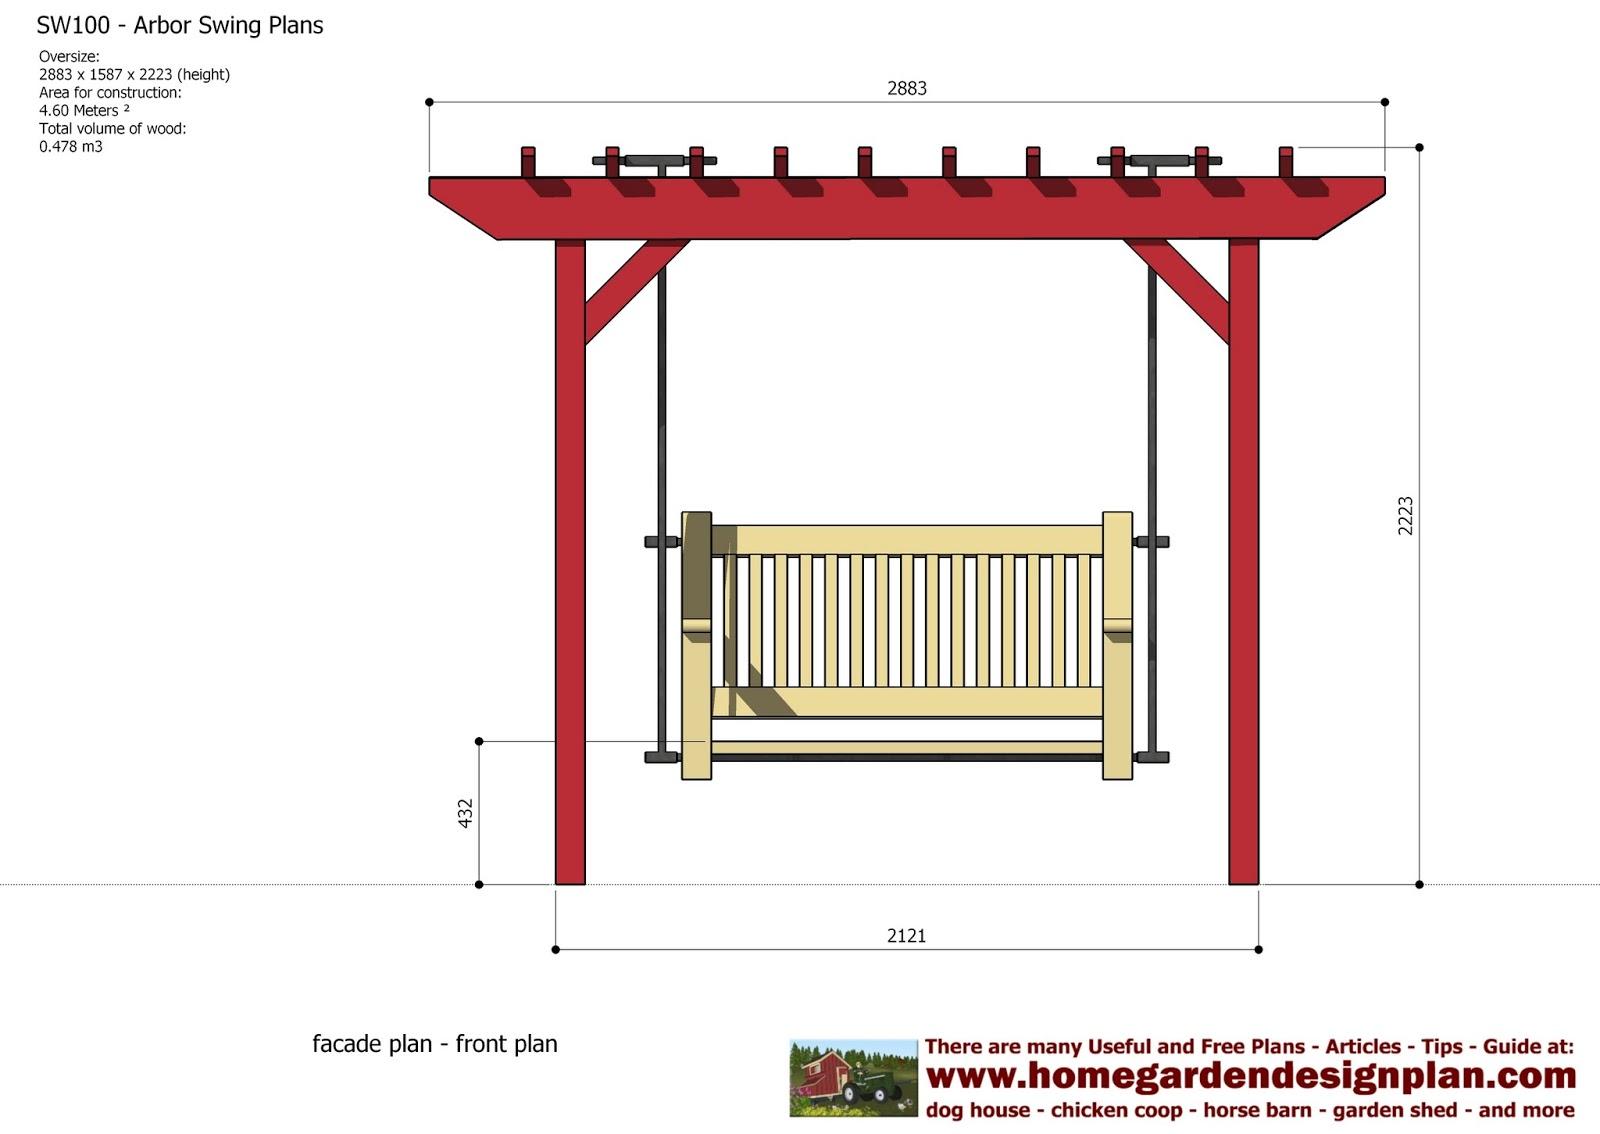 home garden plans SW100 Arbor Swing Plans Swing Woodworking – Garden Swing Plans